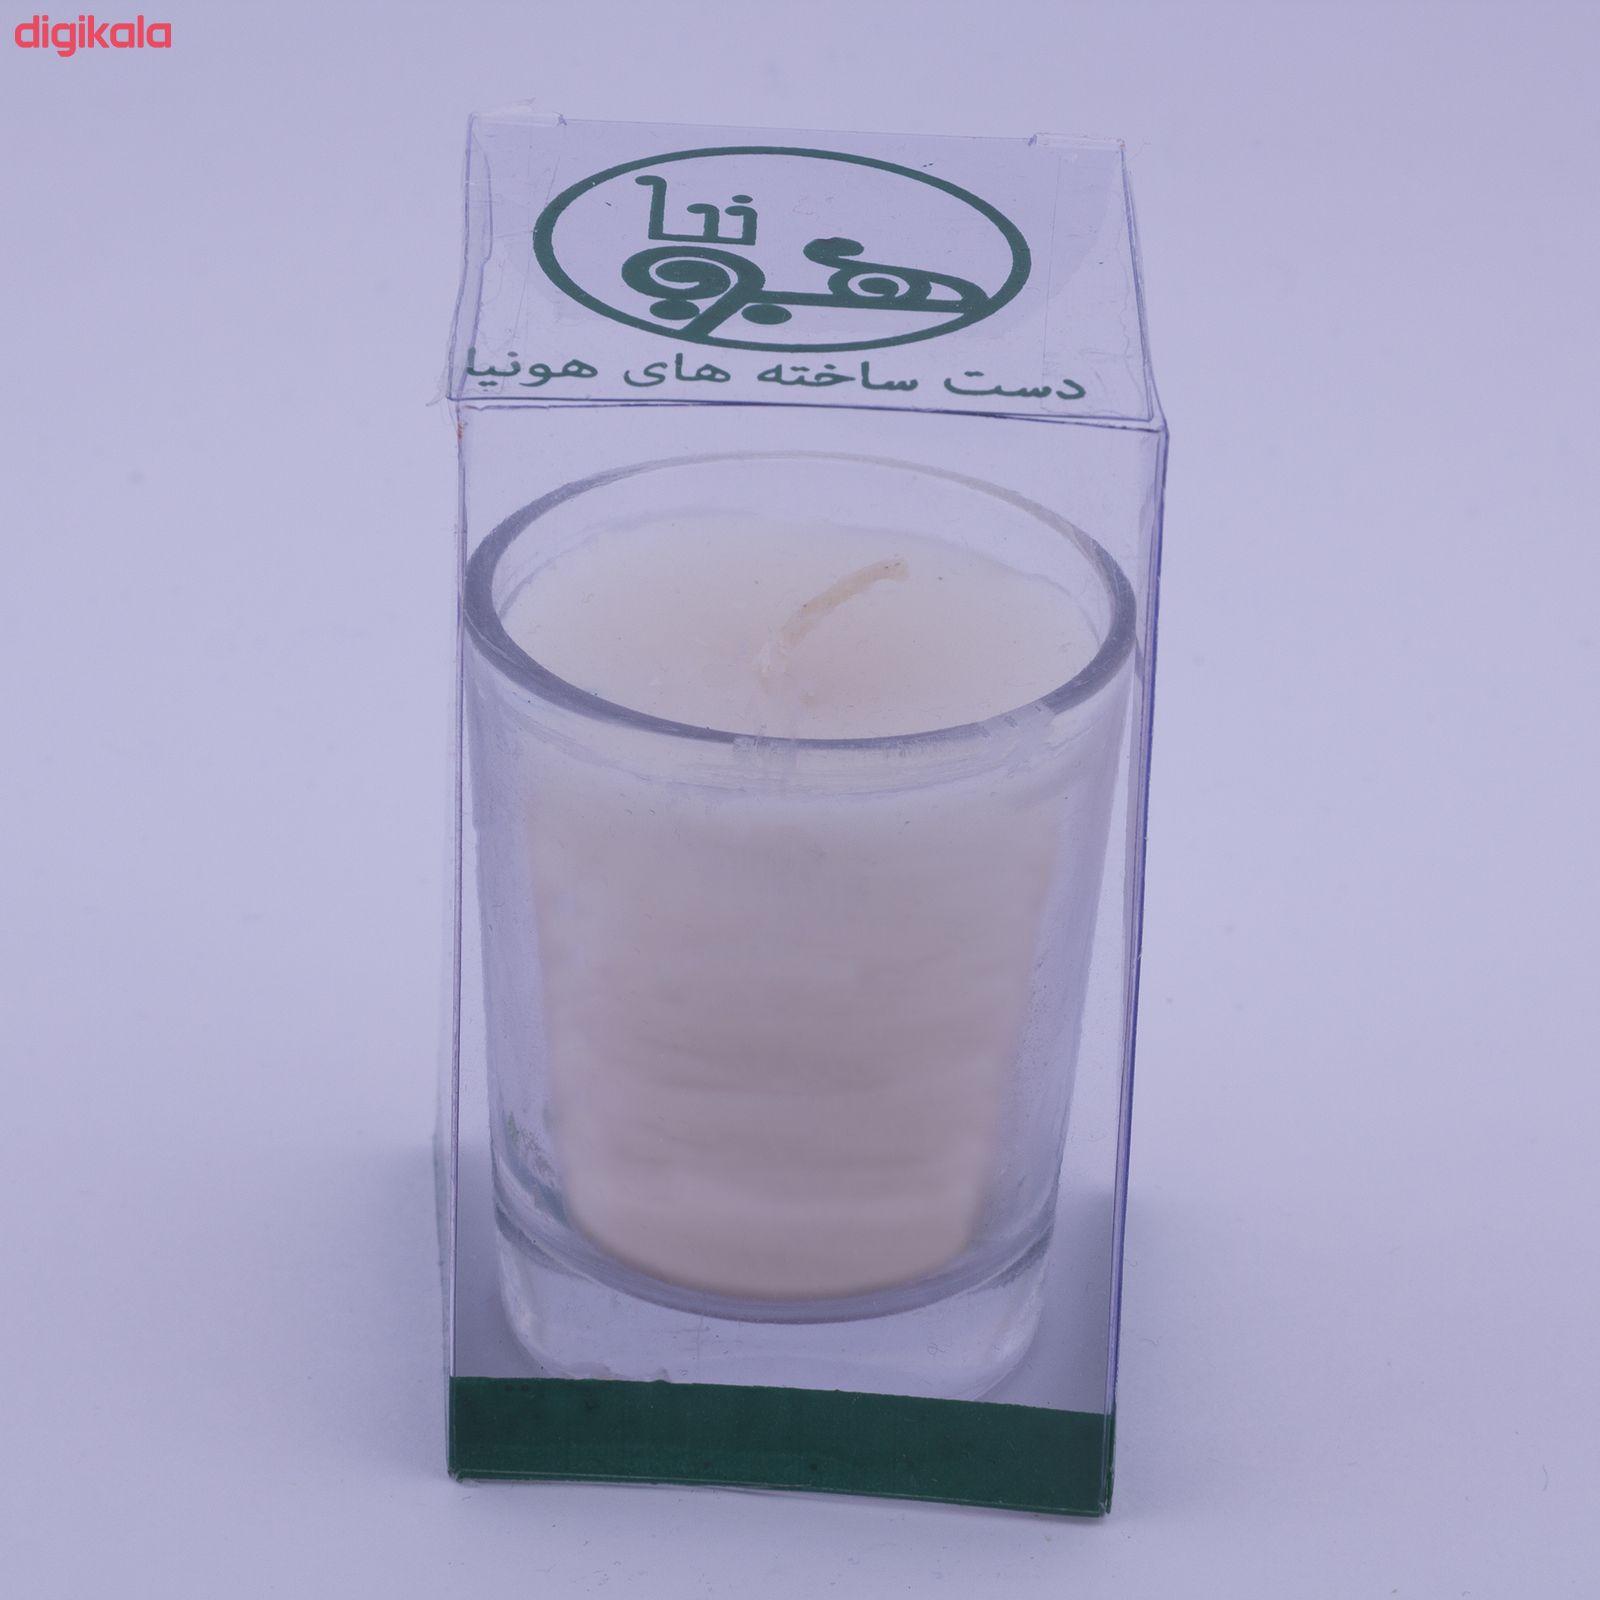 شمع لیوانی هونیا مدل ۱۰۱ main 1 1